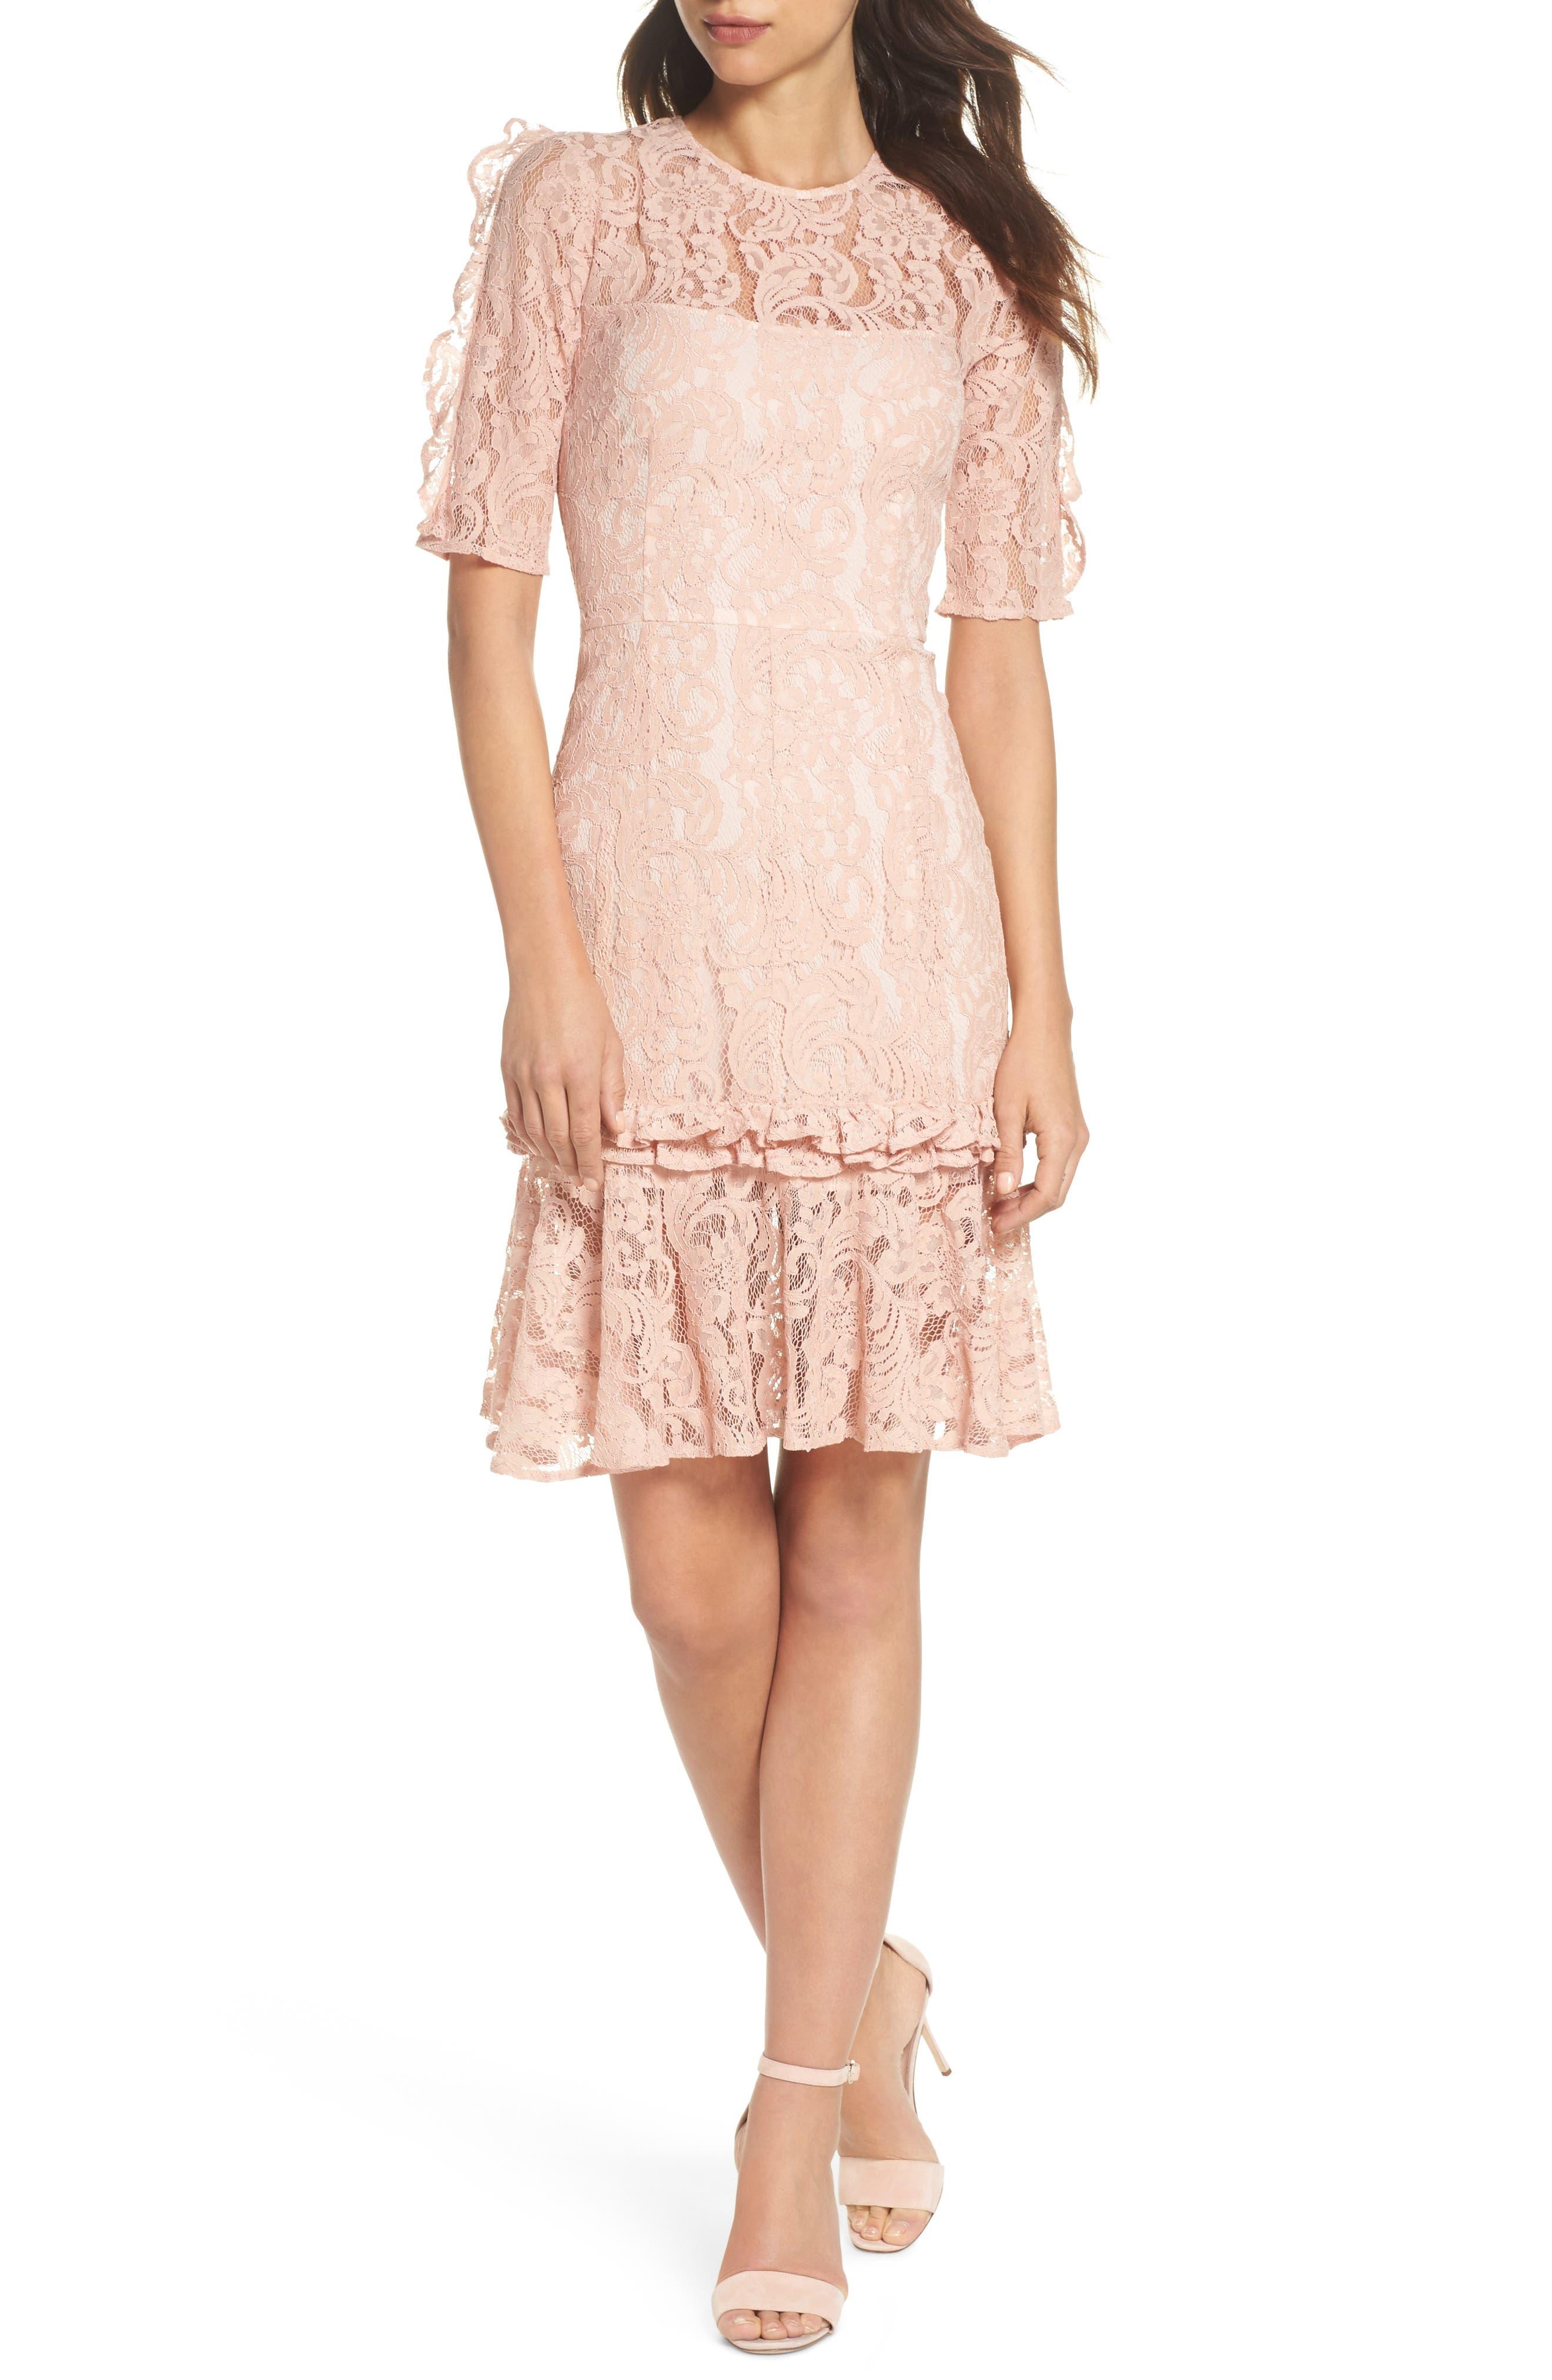 Hushed Dove Lace Dress,                         Main,                         color, Rose Cloud